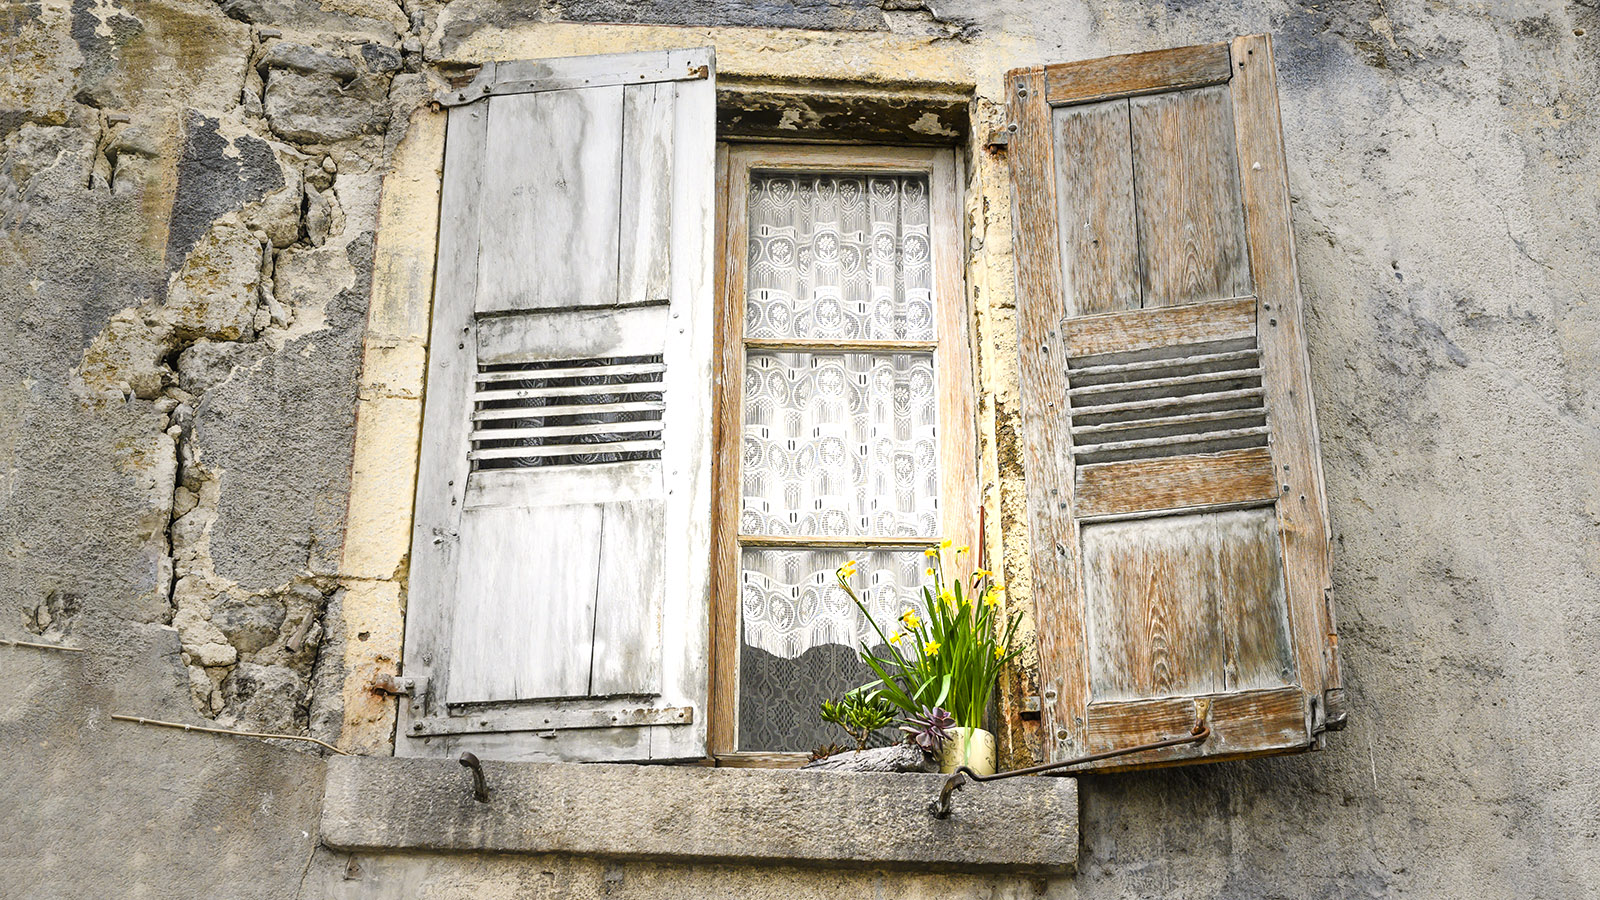 In der Altstadt von Le Puy-en-Velay. Foto: Hilke Maunder